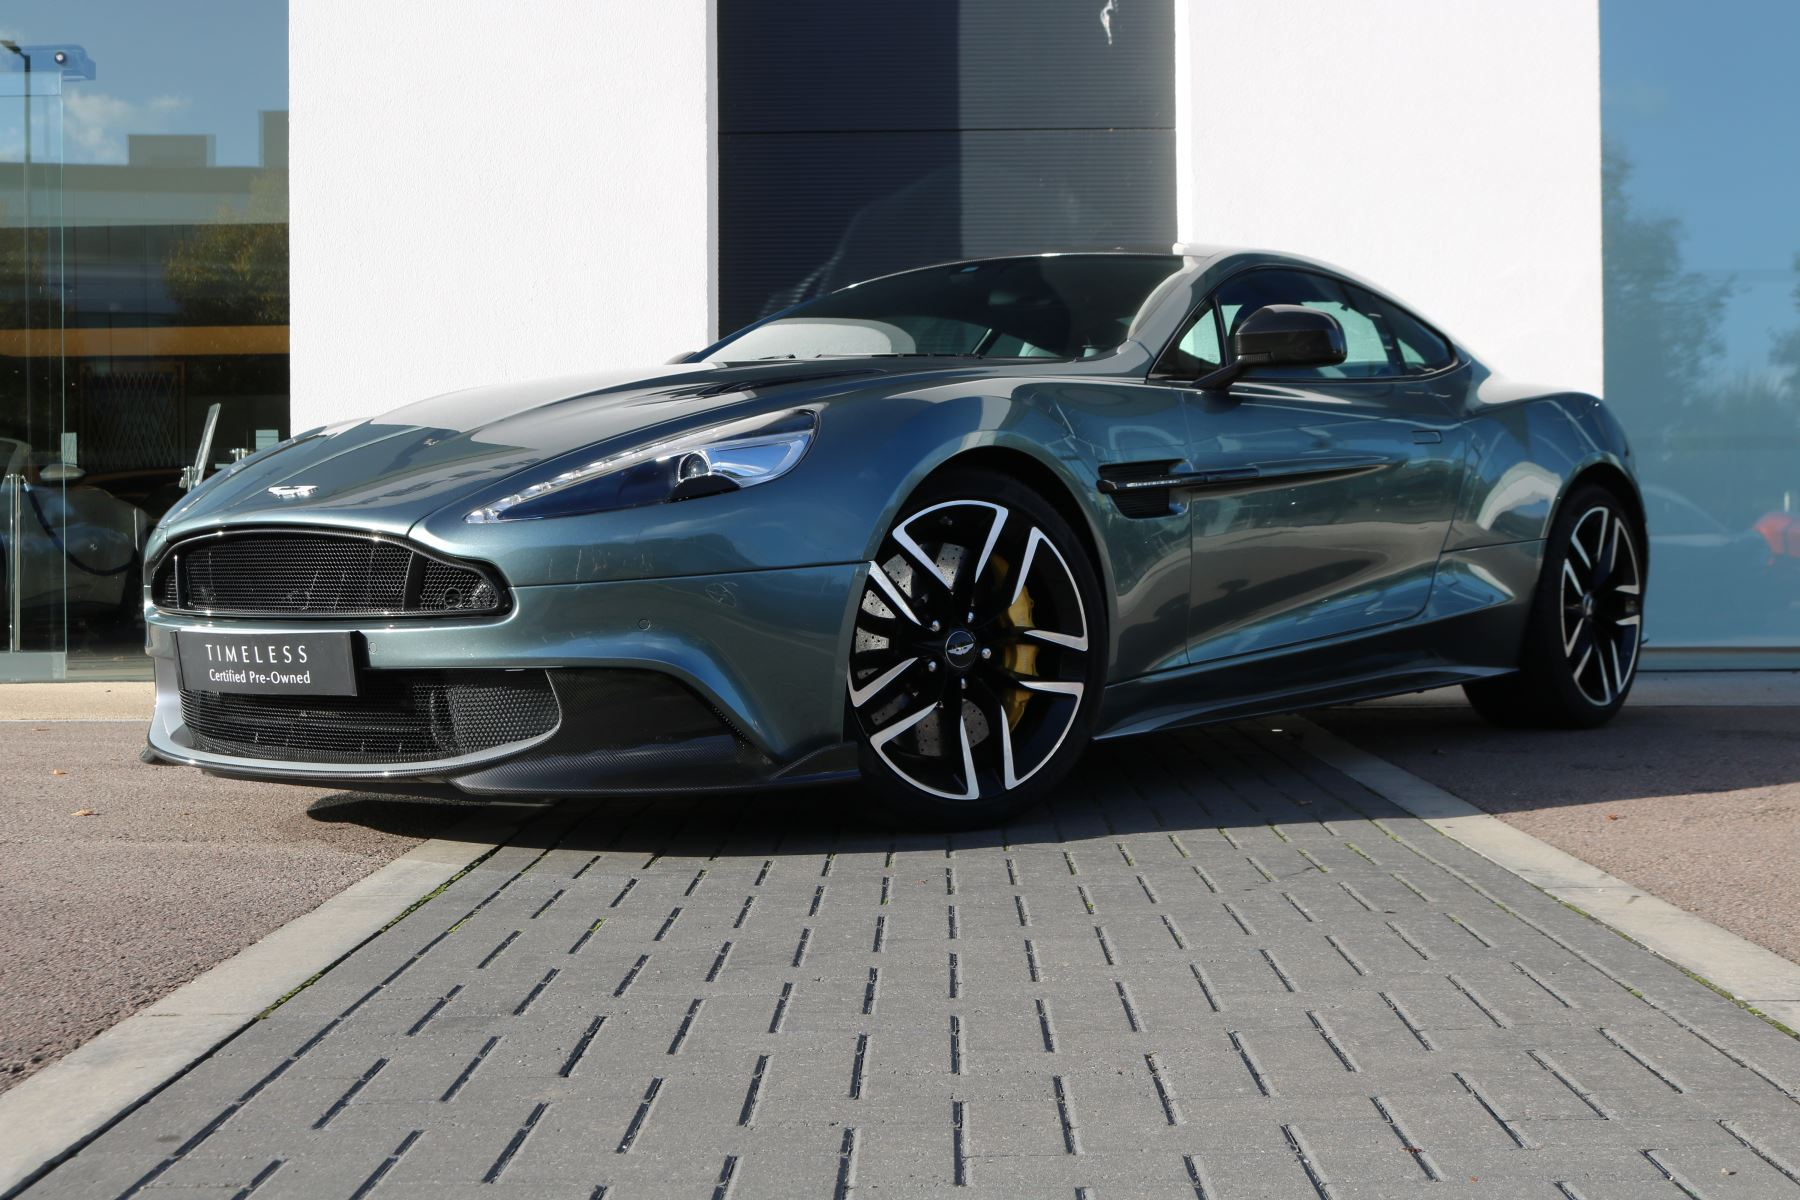 Aston Martin Vanquish S TT3 8 Speed Coupe Rare Stirling Green Paint Last Registered 5.9 2 door (2019) image